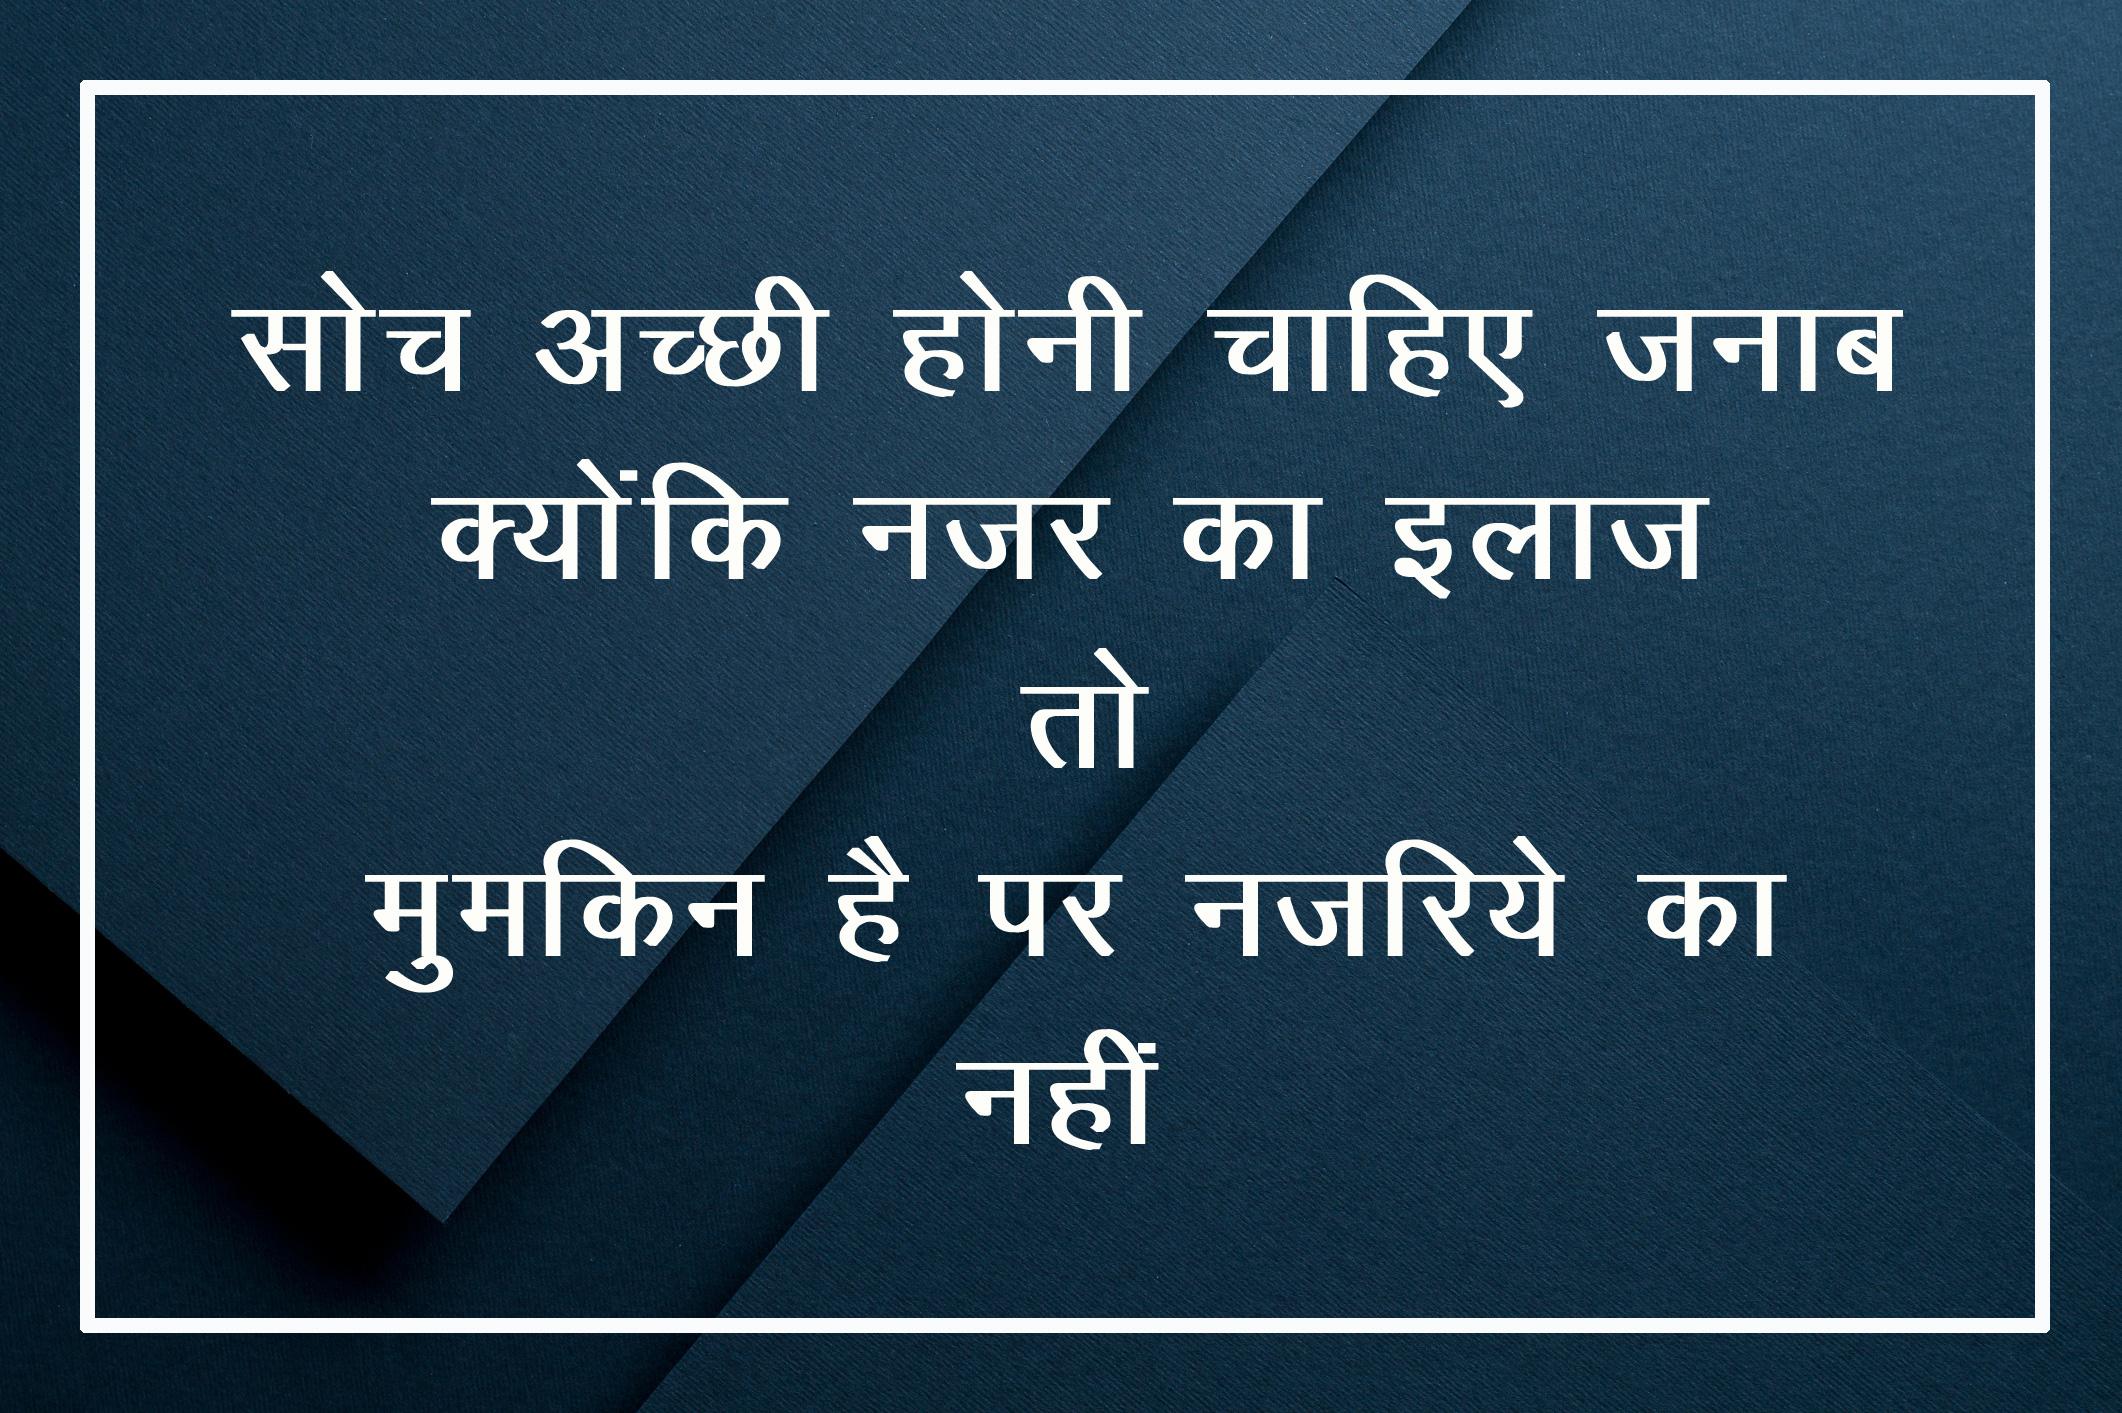 Free Hindi Inspirational Images Wallpaper Download